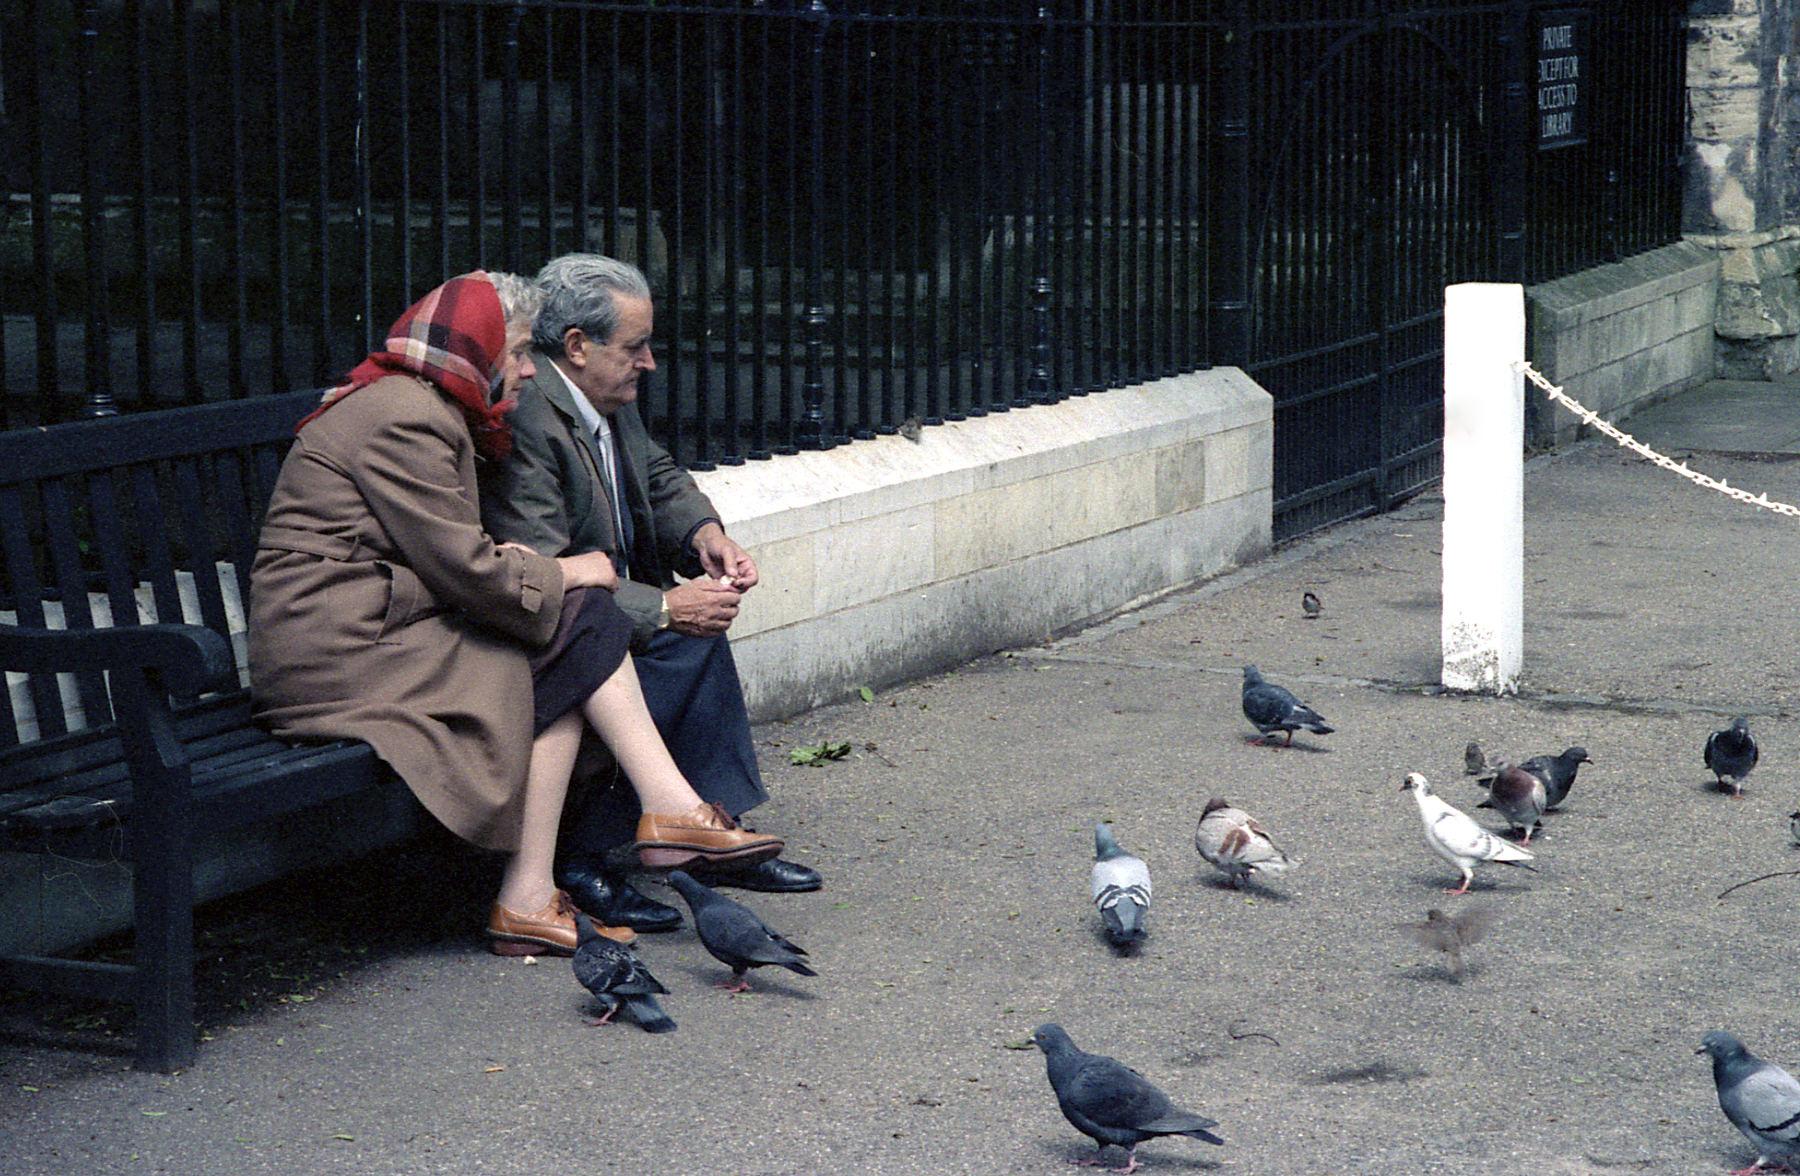 English couple feeding birds